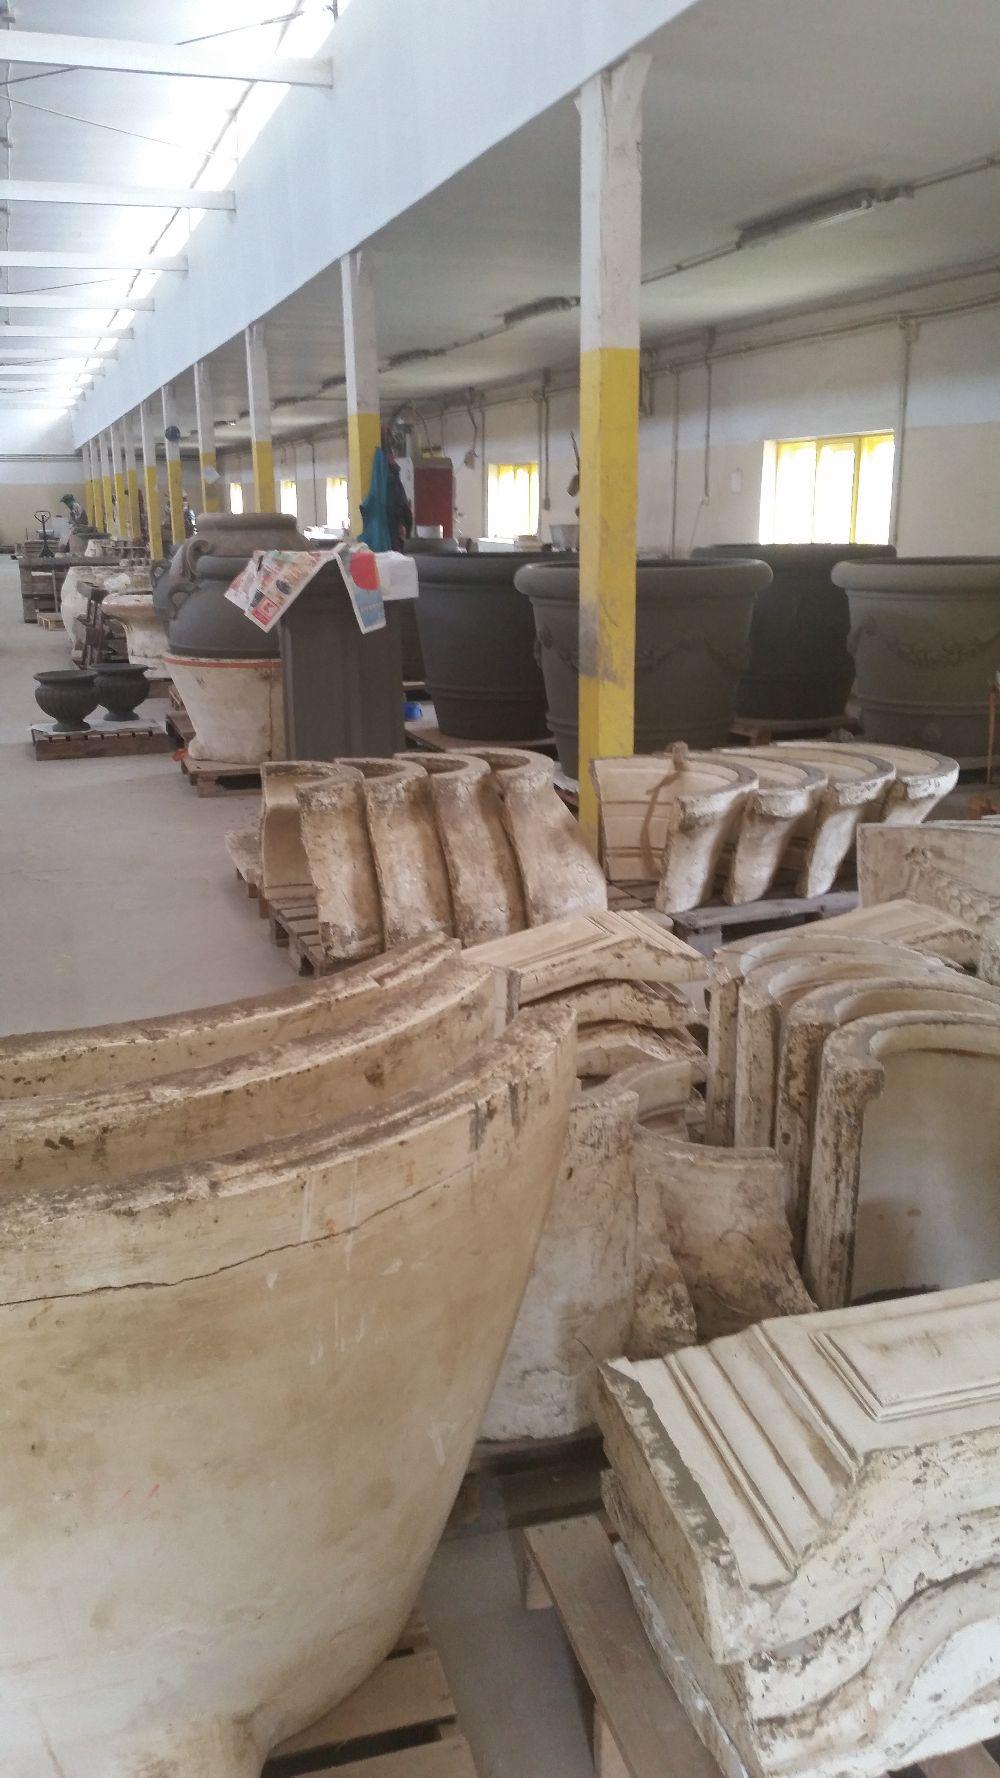 adelaparvu.com despre vase de gradina, ghivece si ornamente din teracota, lut, Terecote Sighisoara Romania (9)